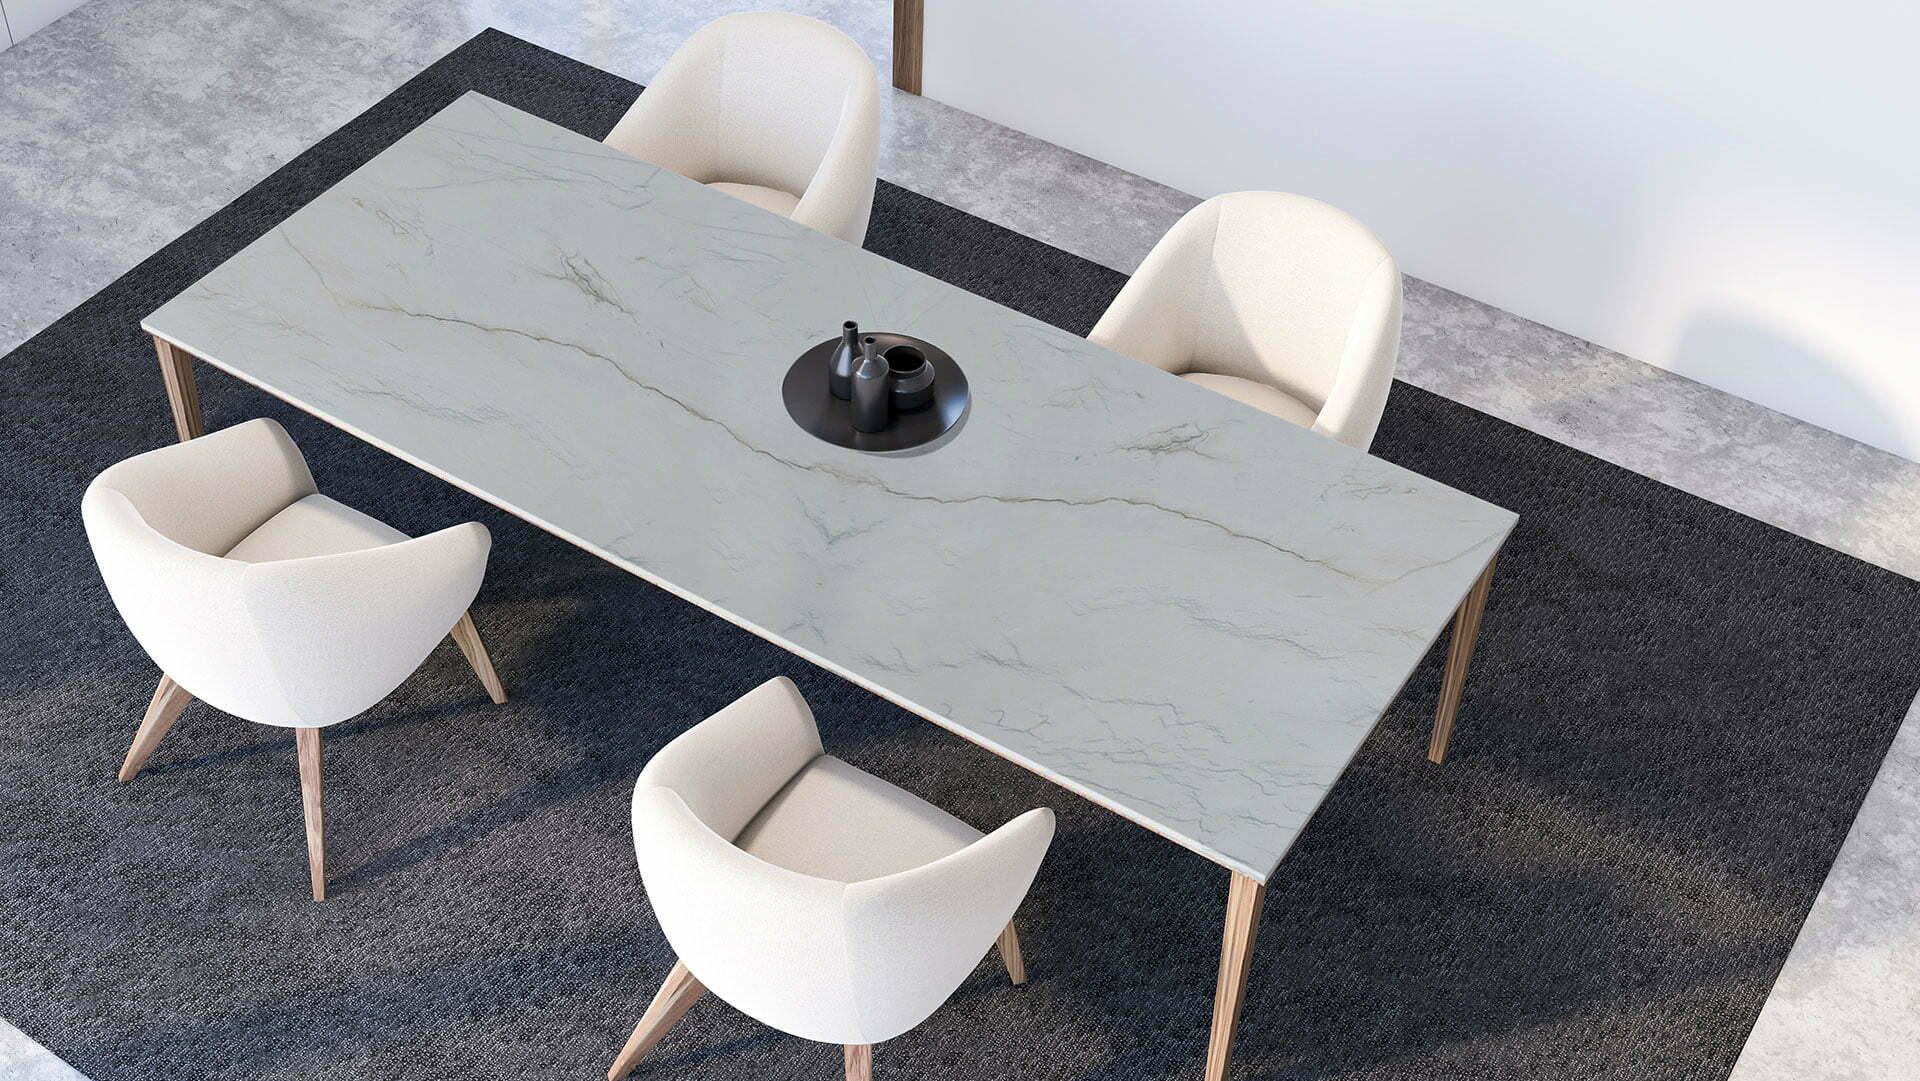 quartzite-mont-blanc-table